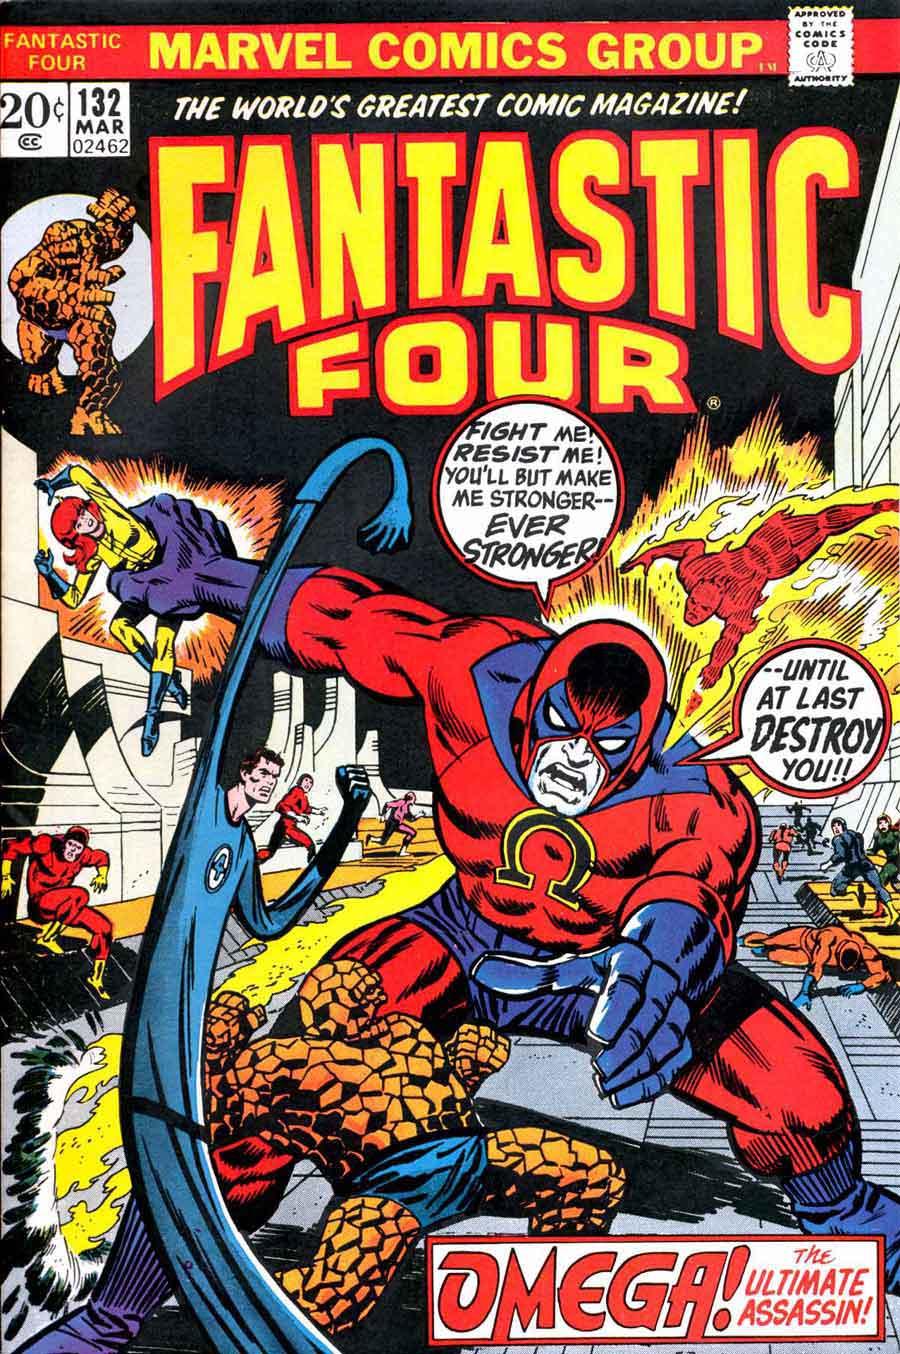 Comic Book Cover Art : Fantastic four jim steranko cover pencil ink